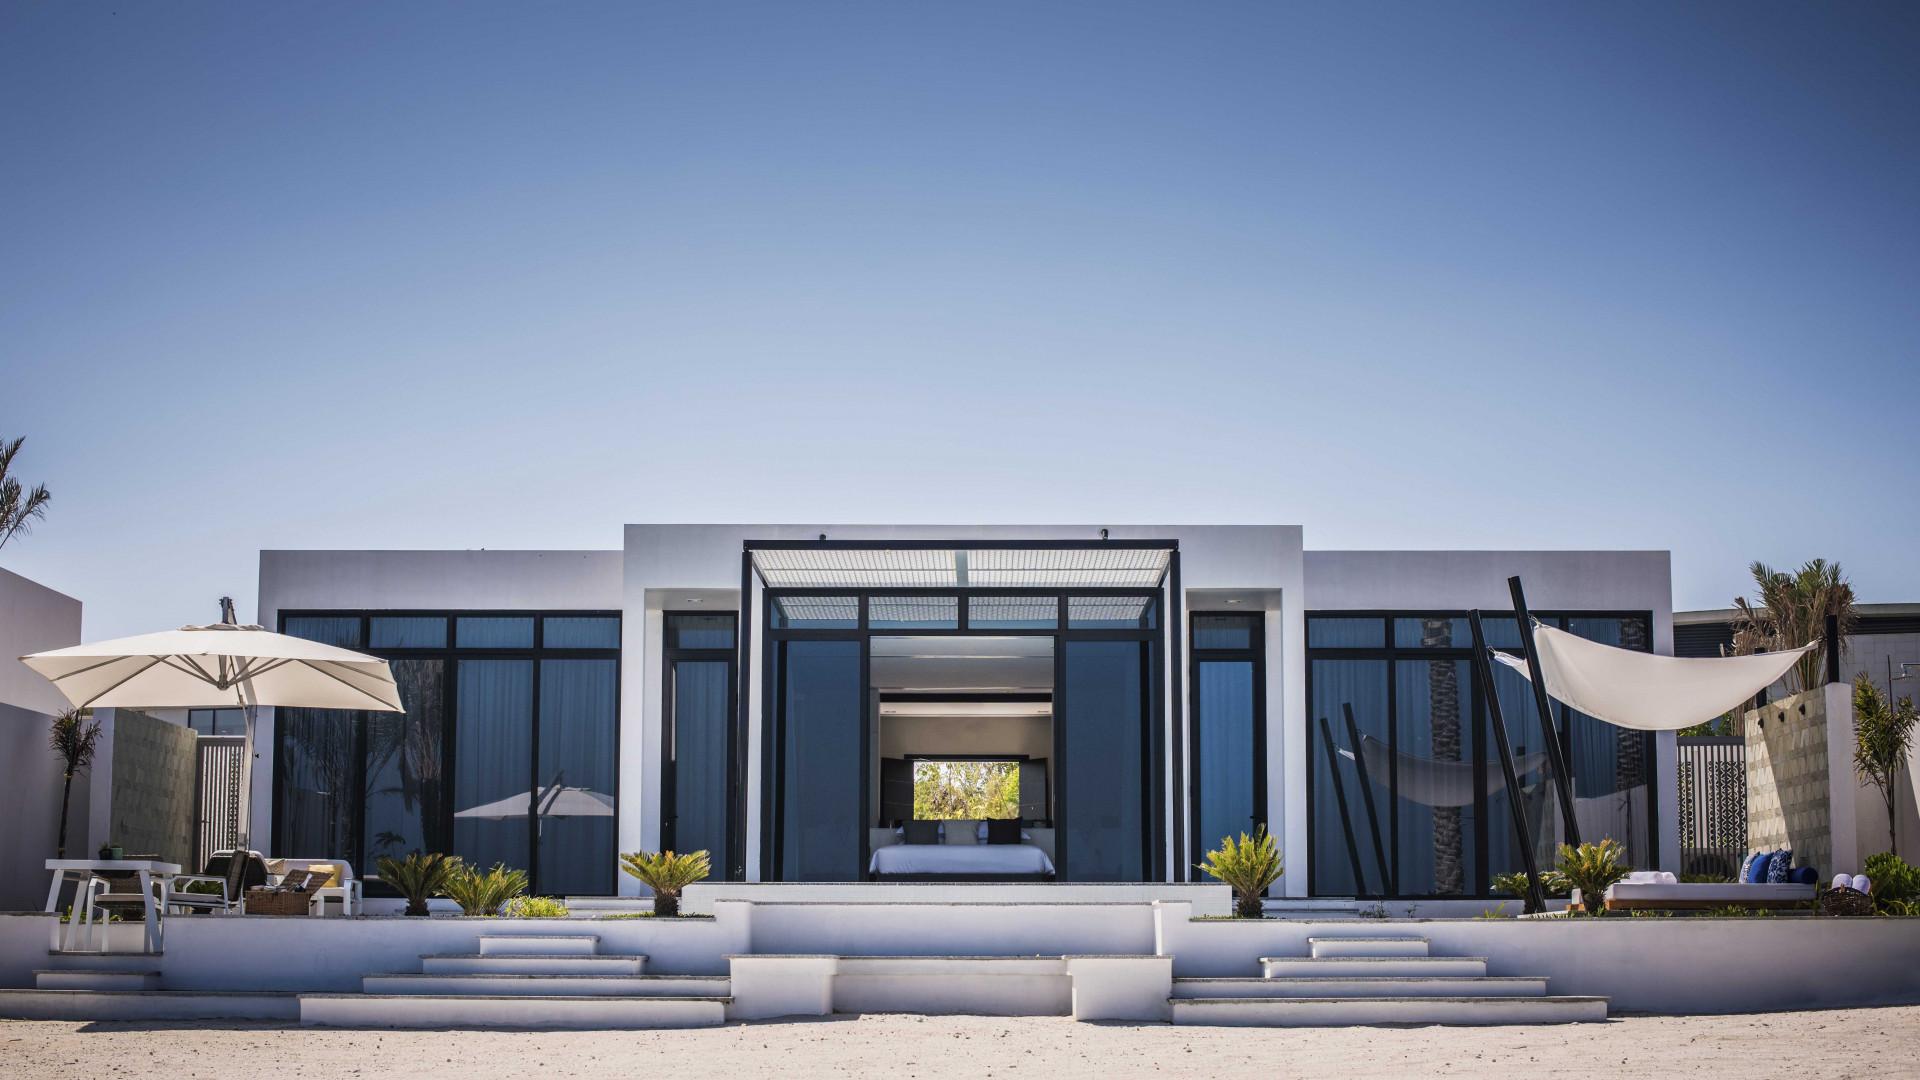 Exterior of Zaya Nurai resort, Abu Dhabi, UAE